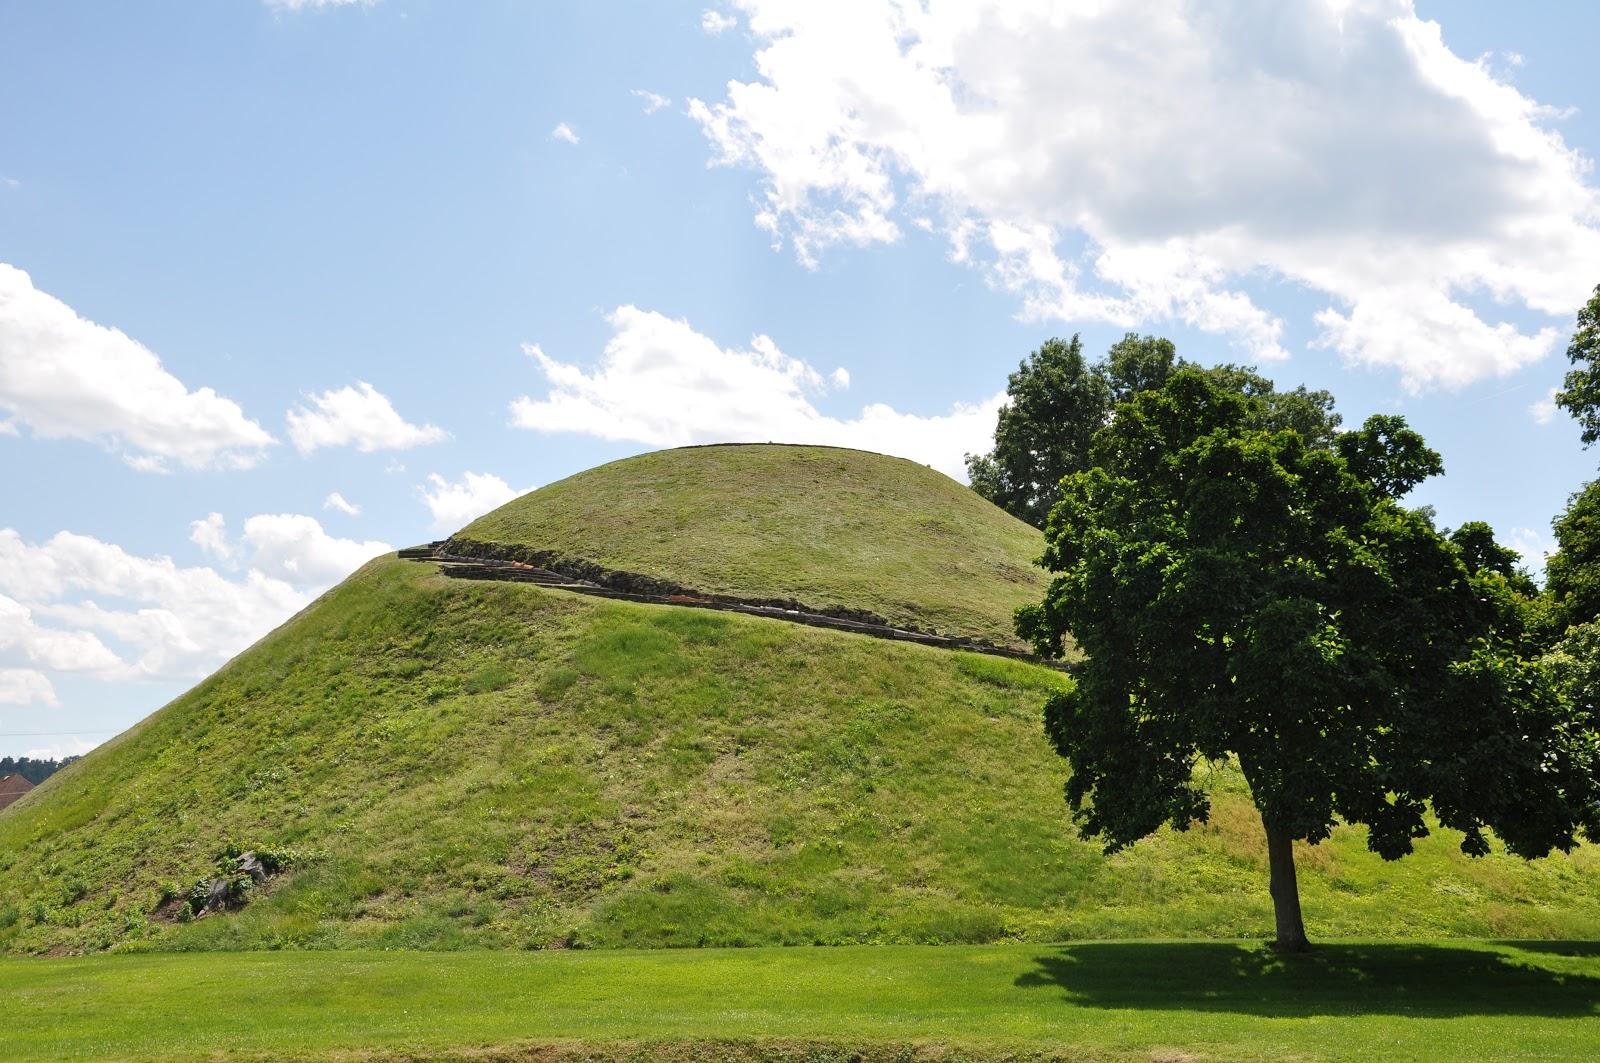 MidAtlantic DayTrips: Grave Creek Burial Mound: Last Remnant